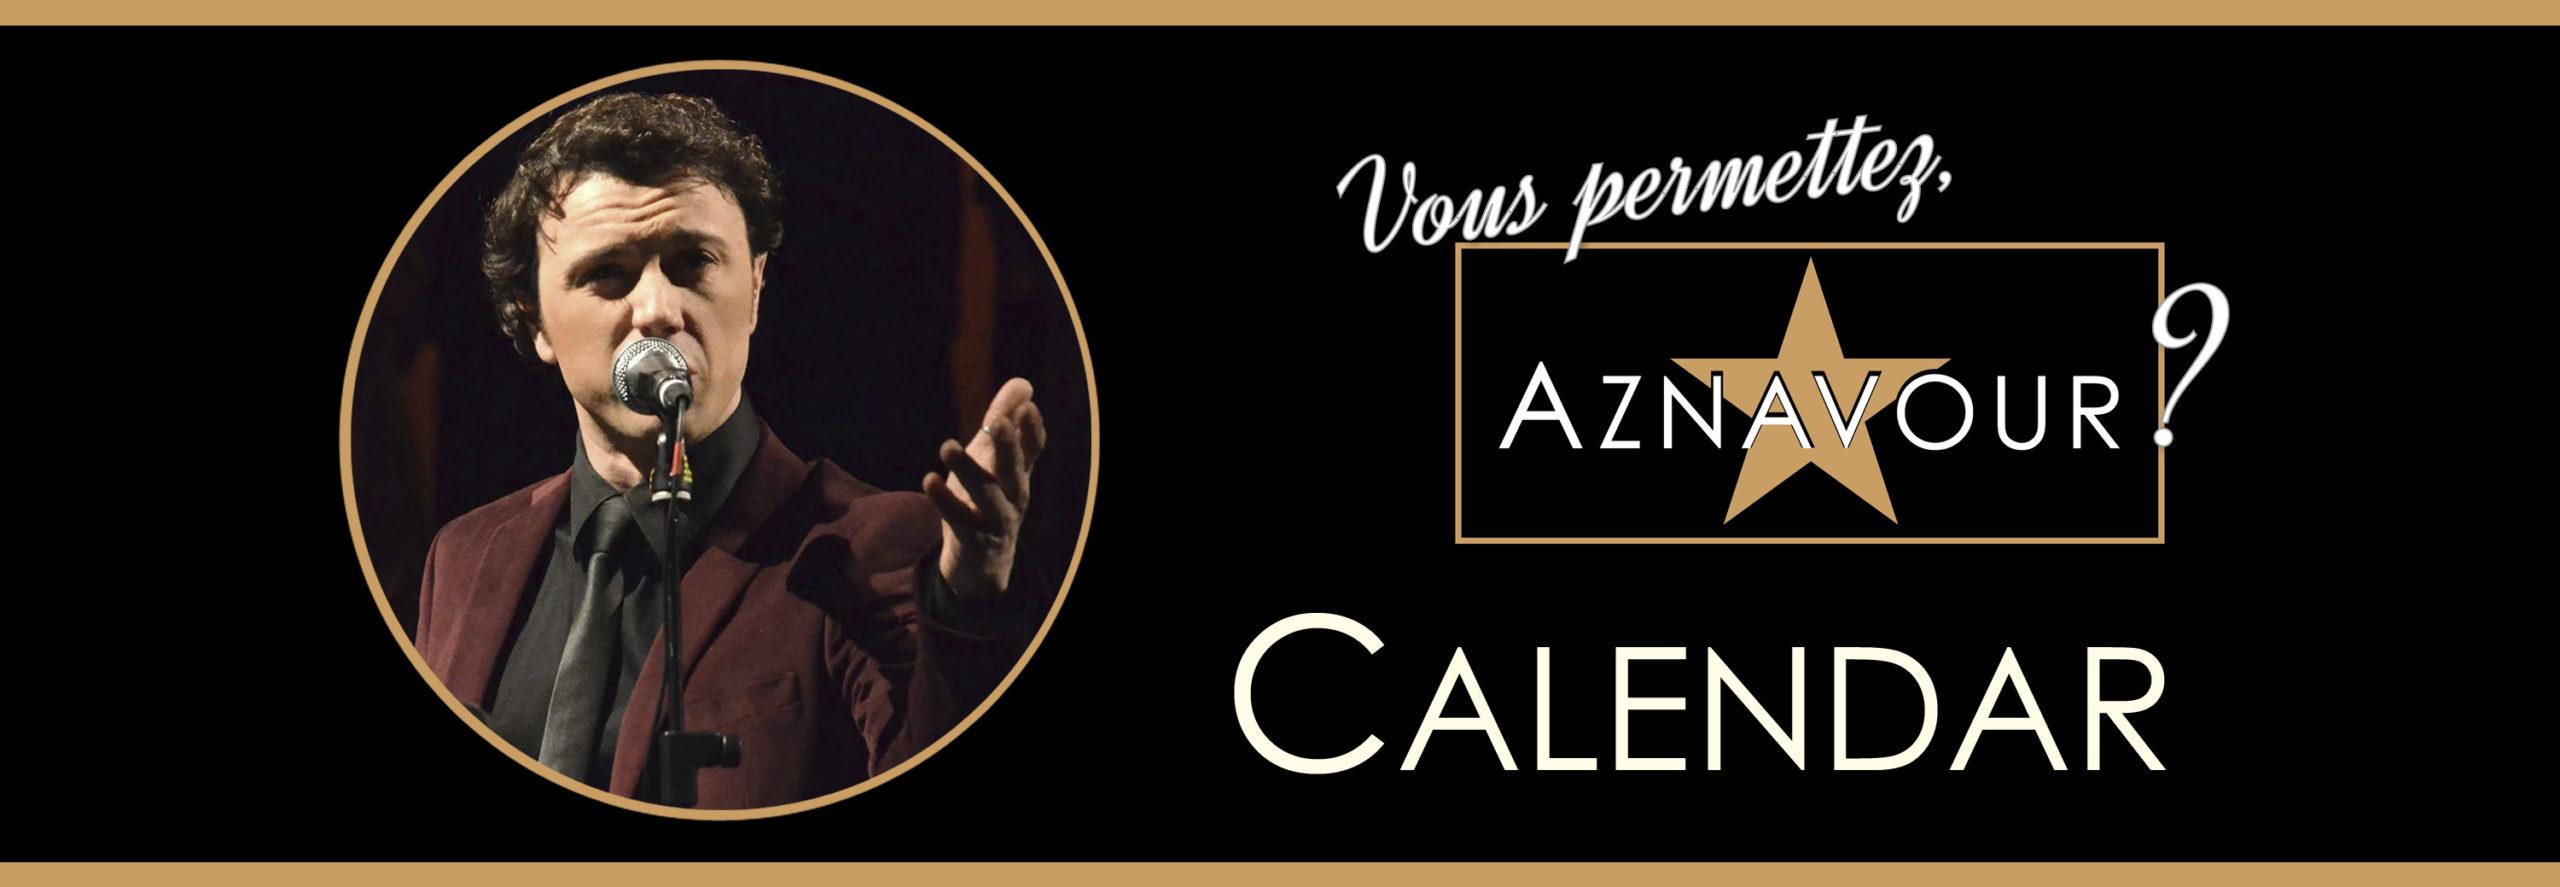 Michelangelo Nari - Calendar